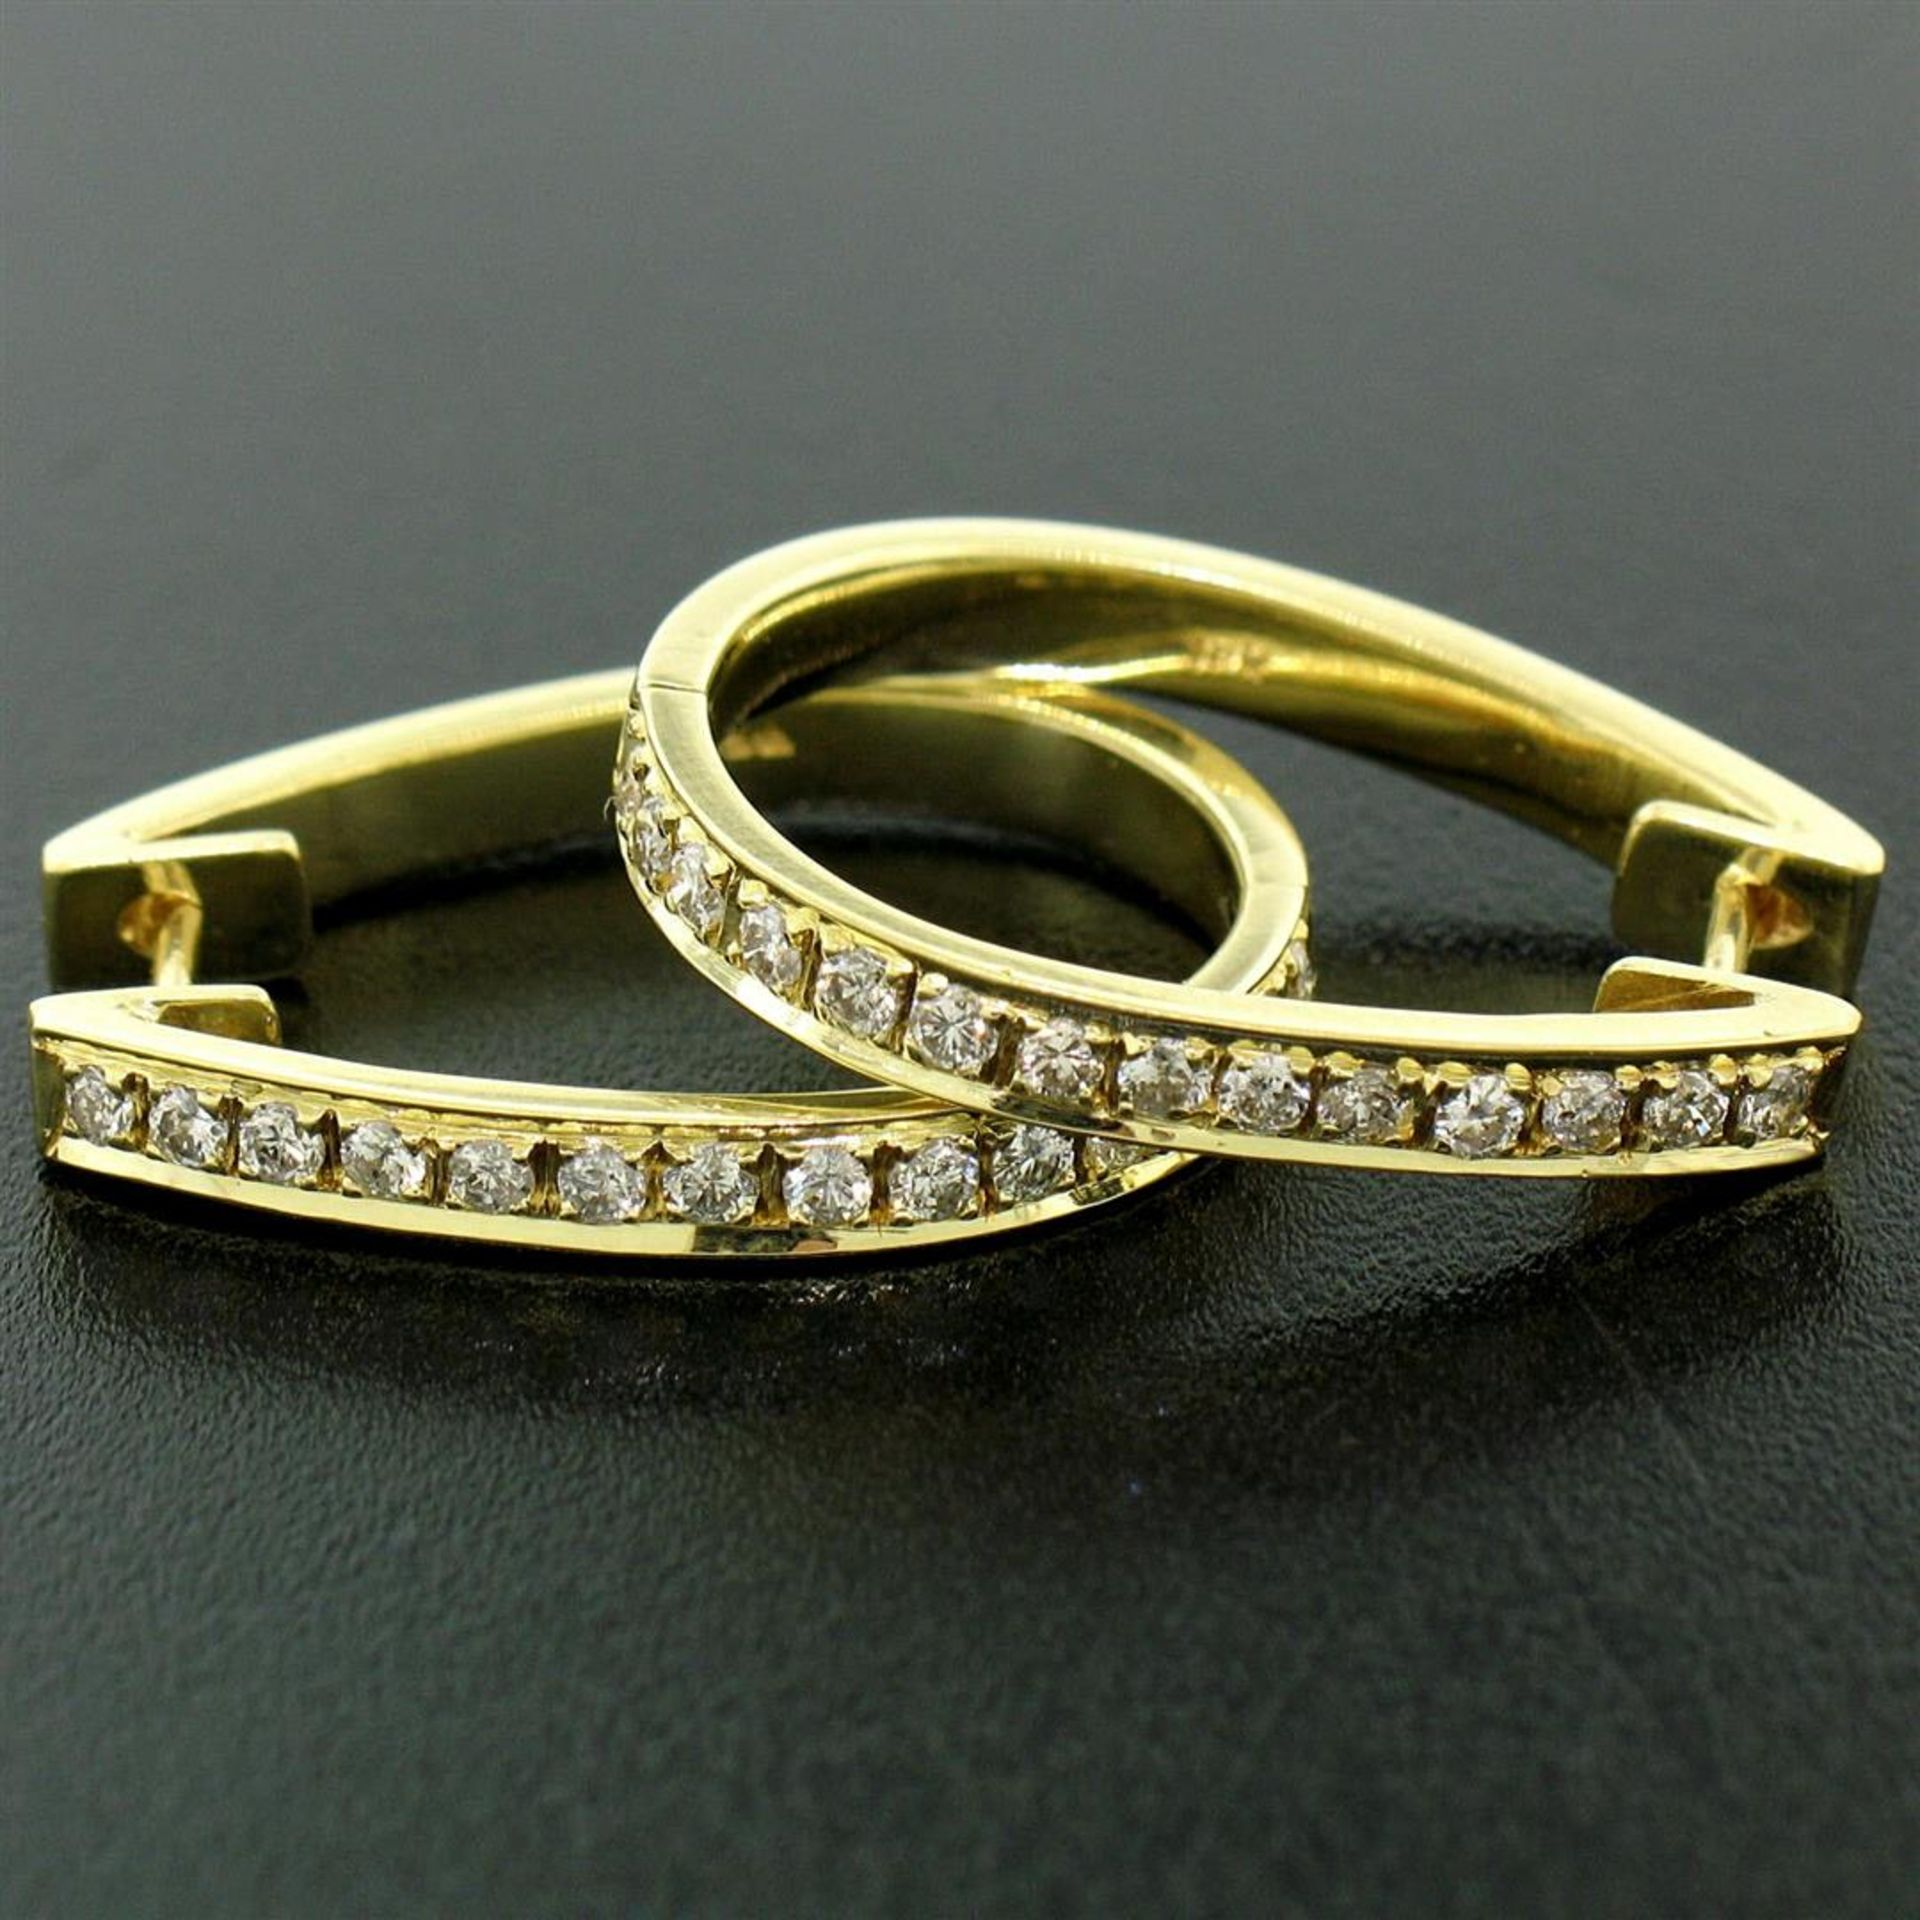 18kt Yellow Gold 0.75ctw Diamond Oval Hoop Earrings - Image 3 of 7